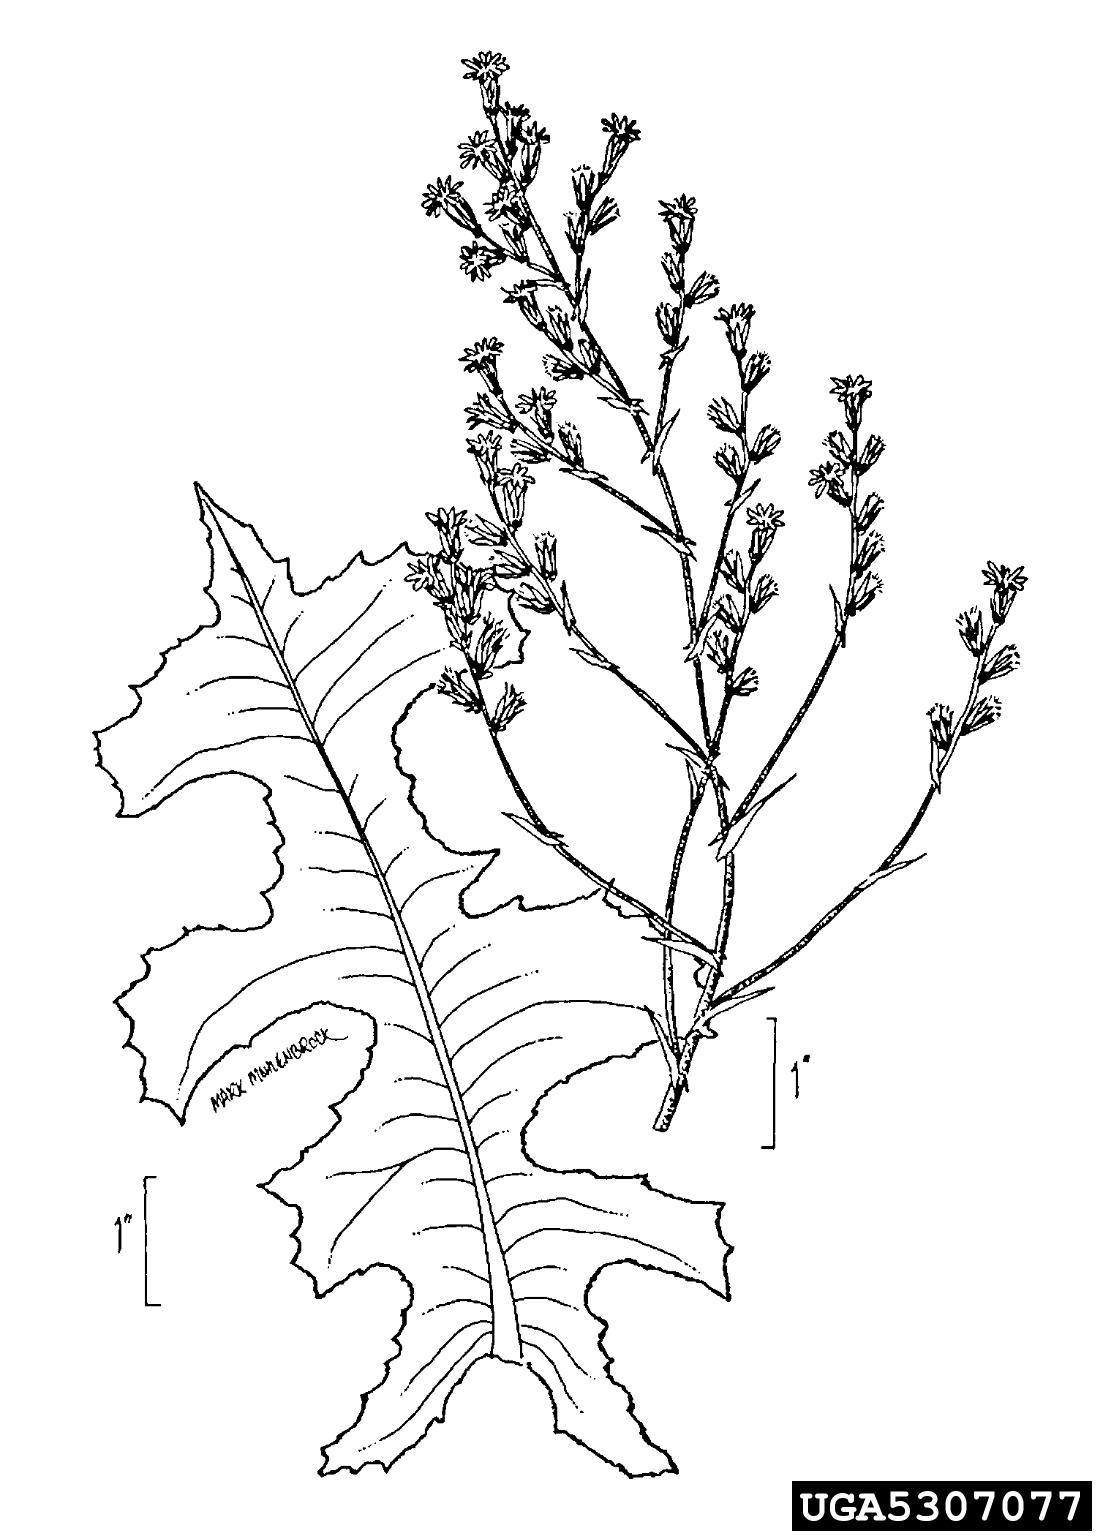 Prickly Lettuce Lactuca Serriola Asterales Asteraceae